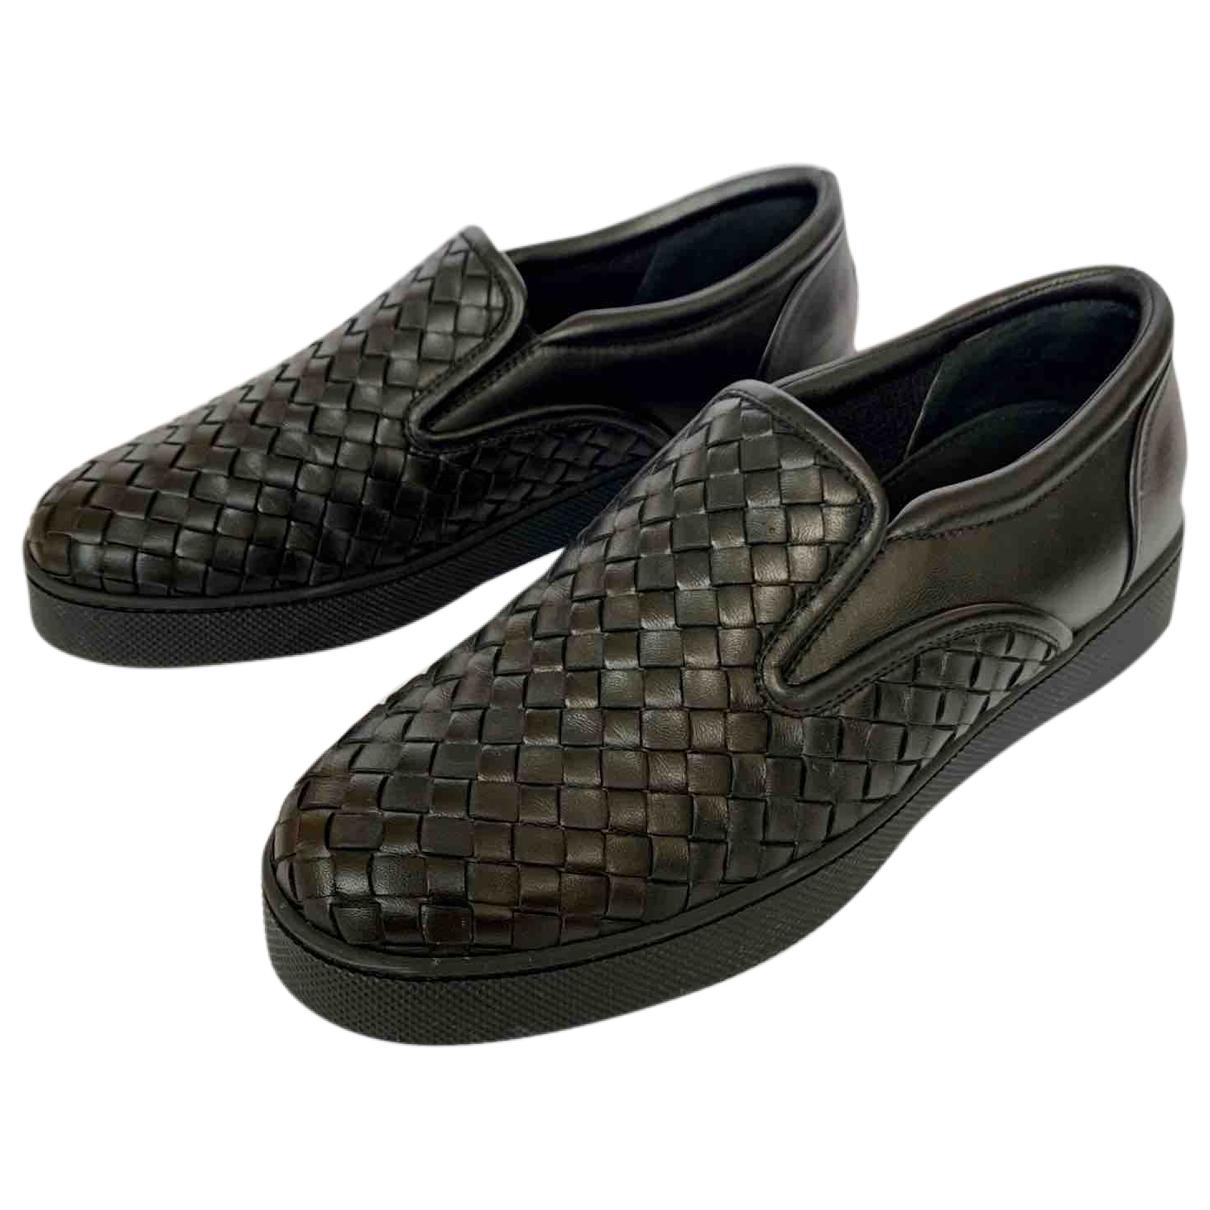 Bottega Veneta \N Sneakers in  Schwarz Leder